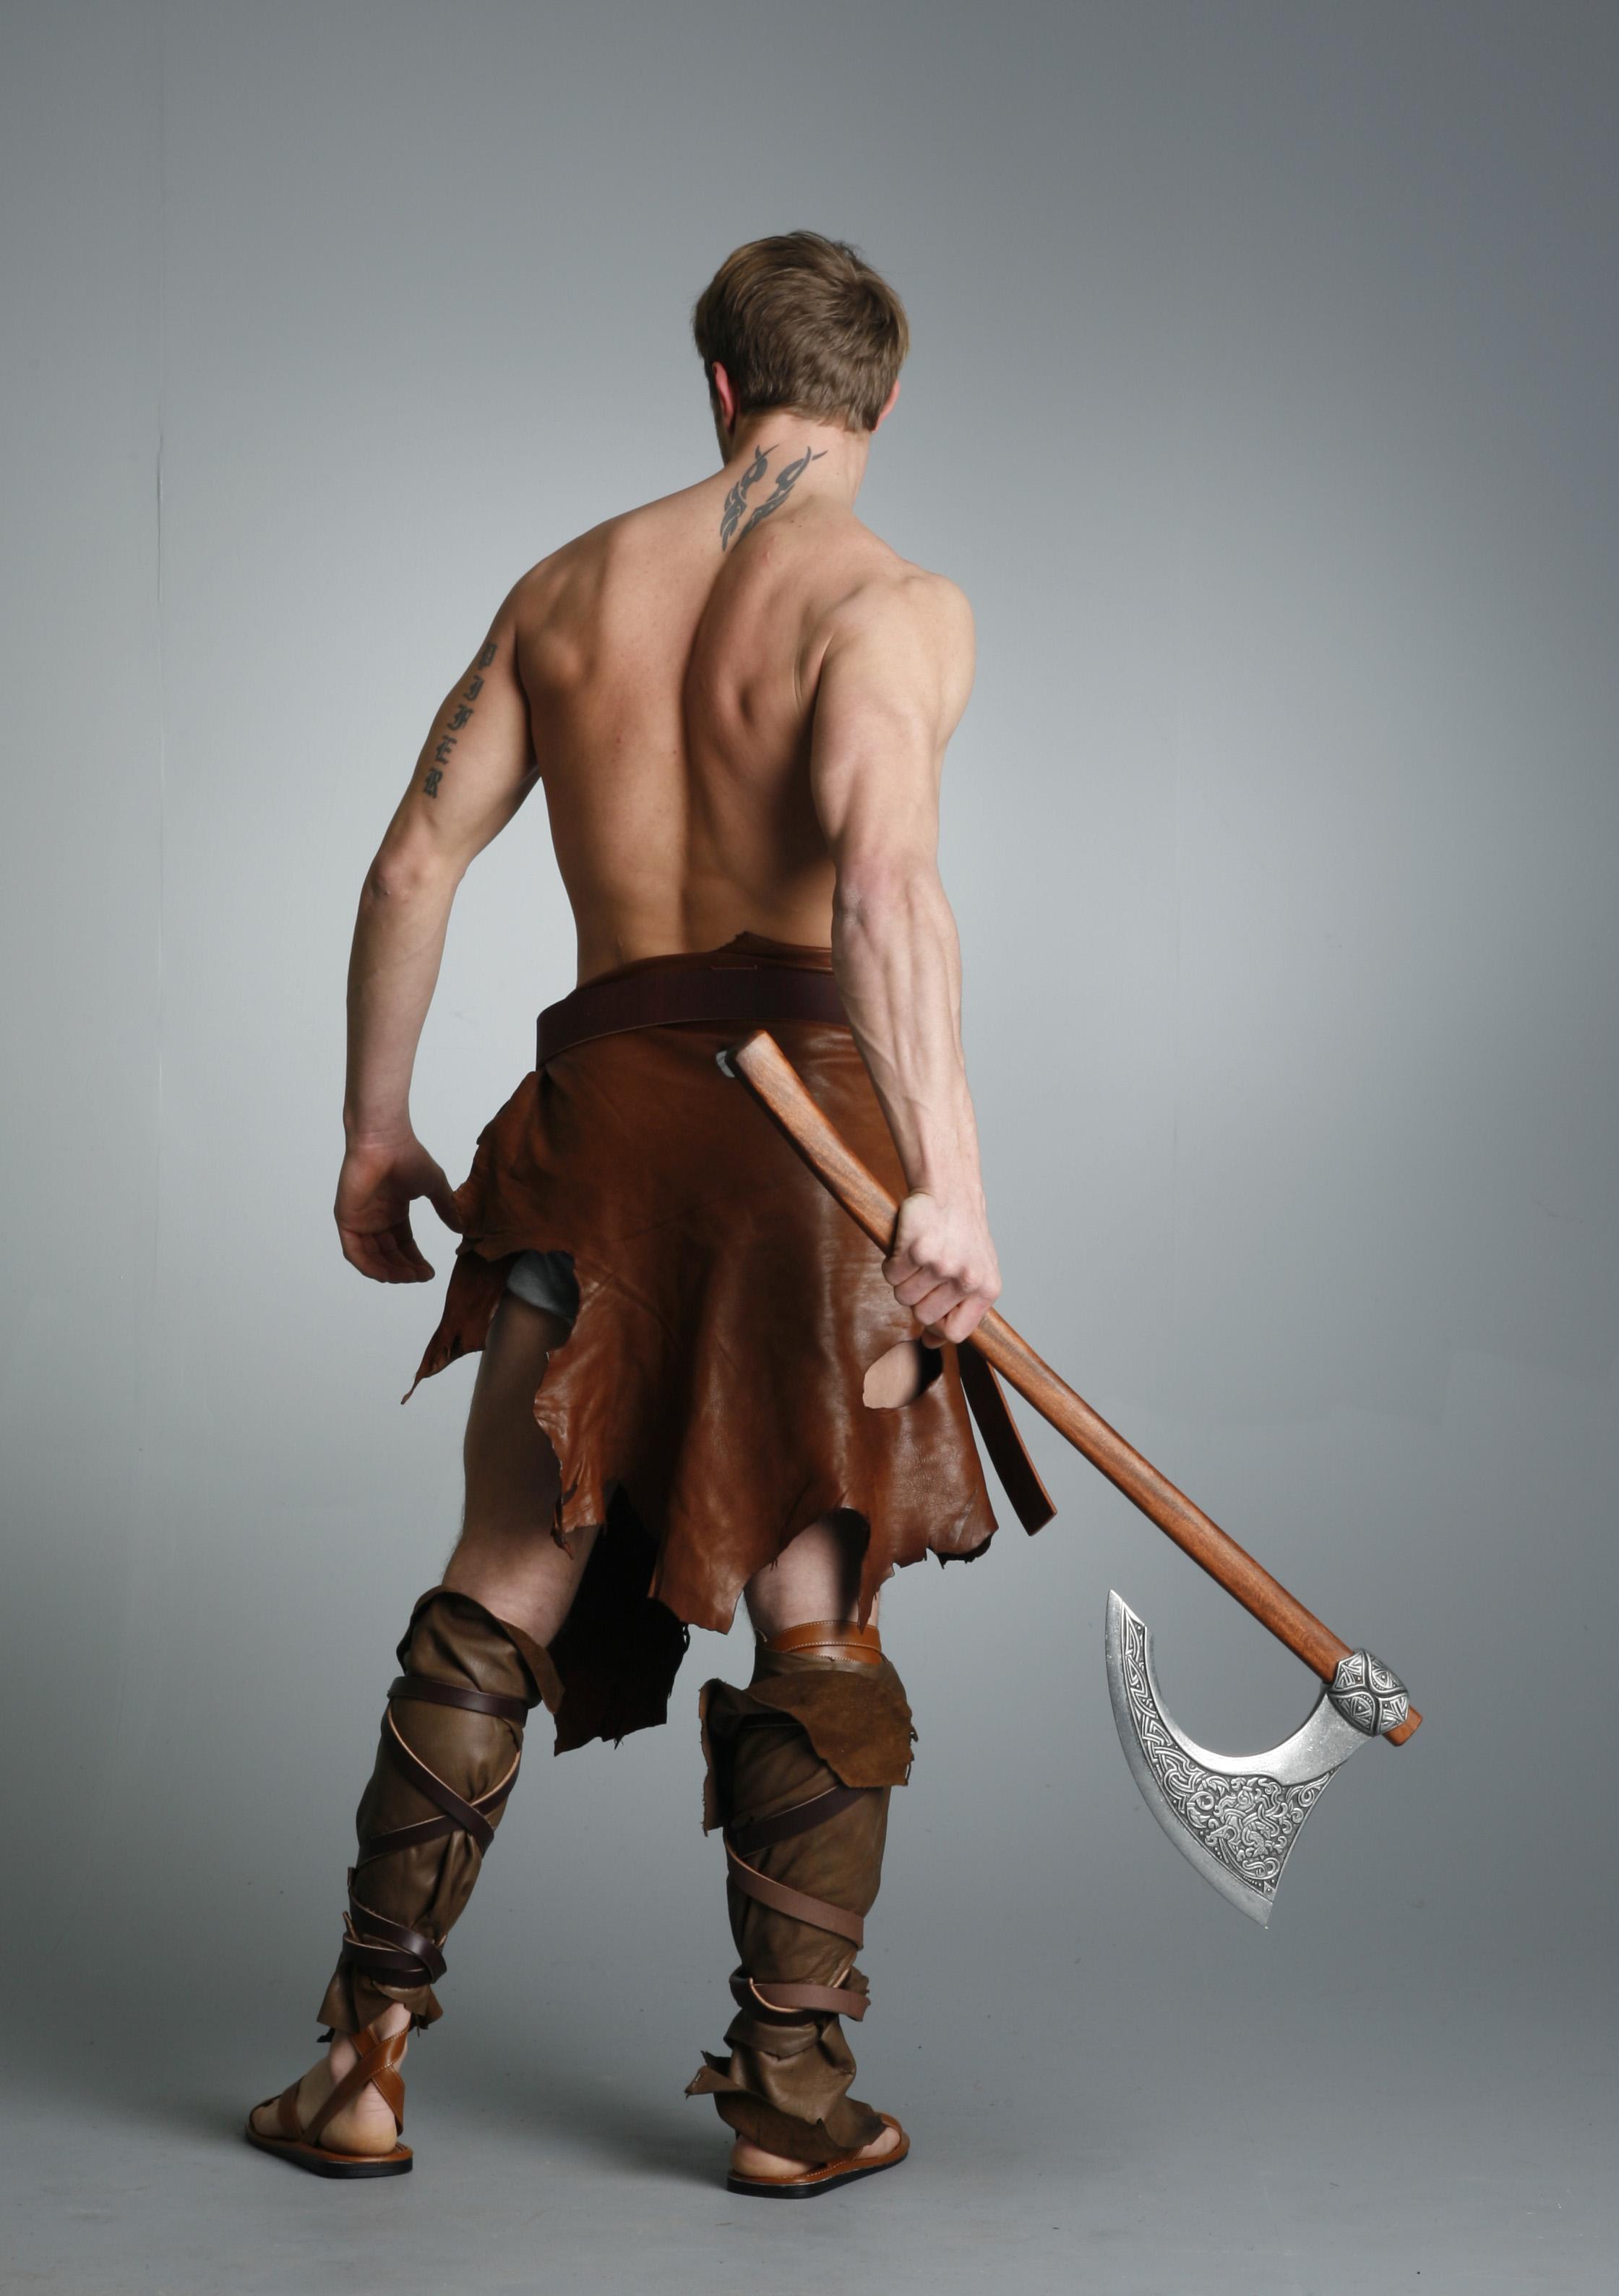 Barbarian Warrior - 27 by mjranum-stock